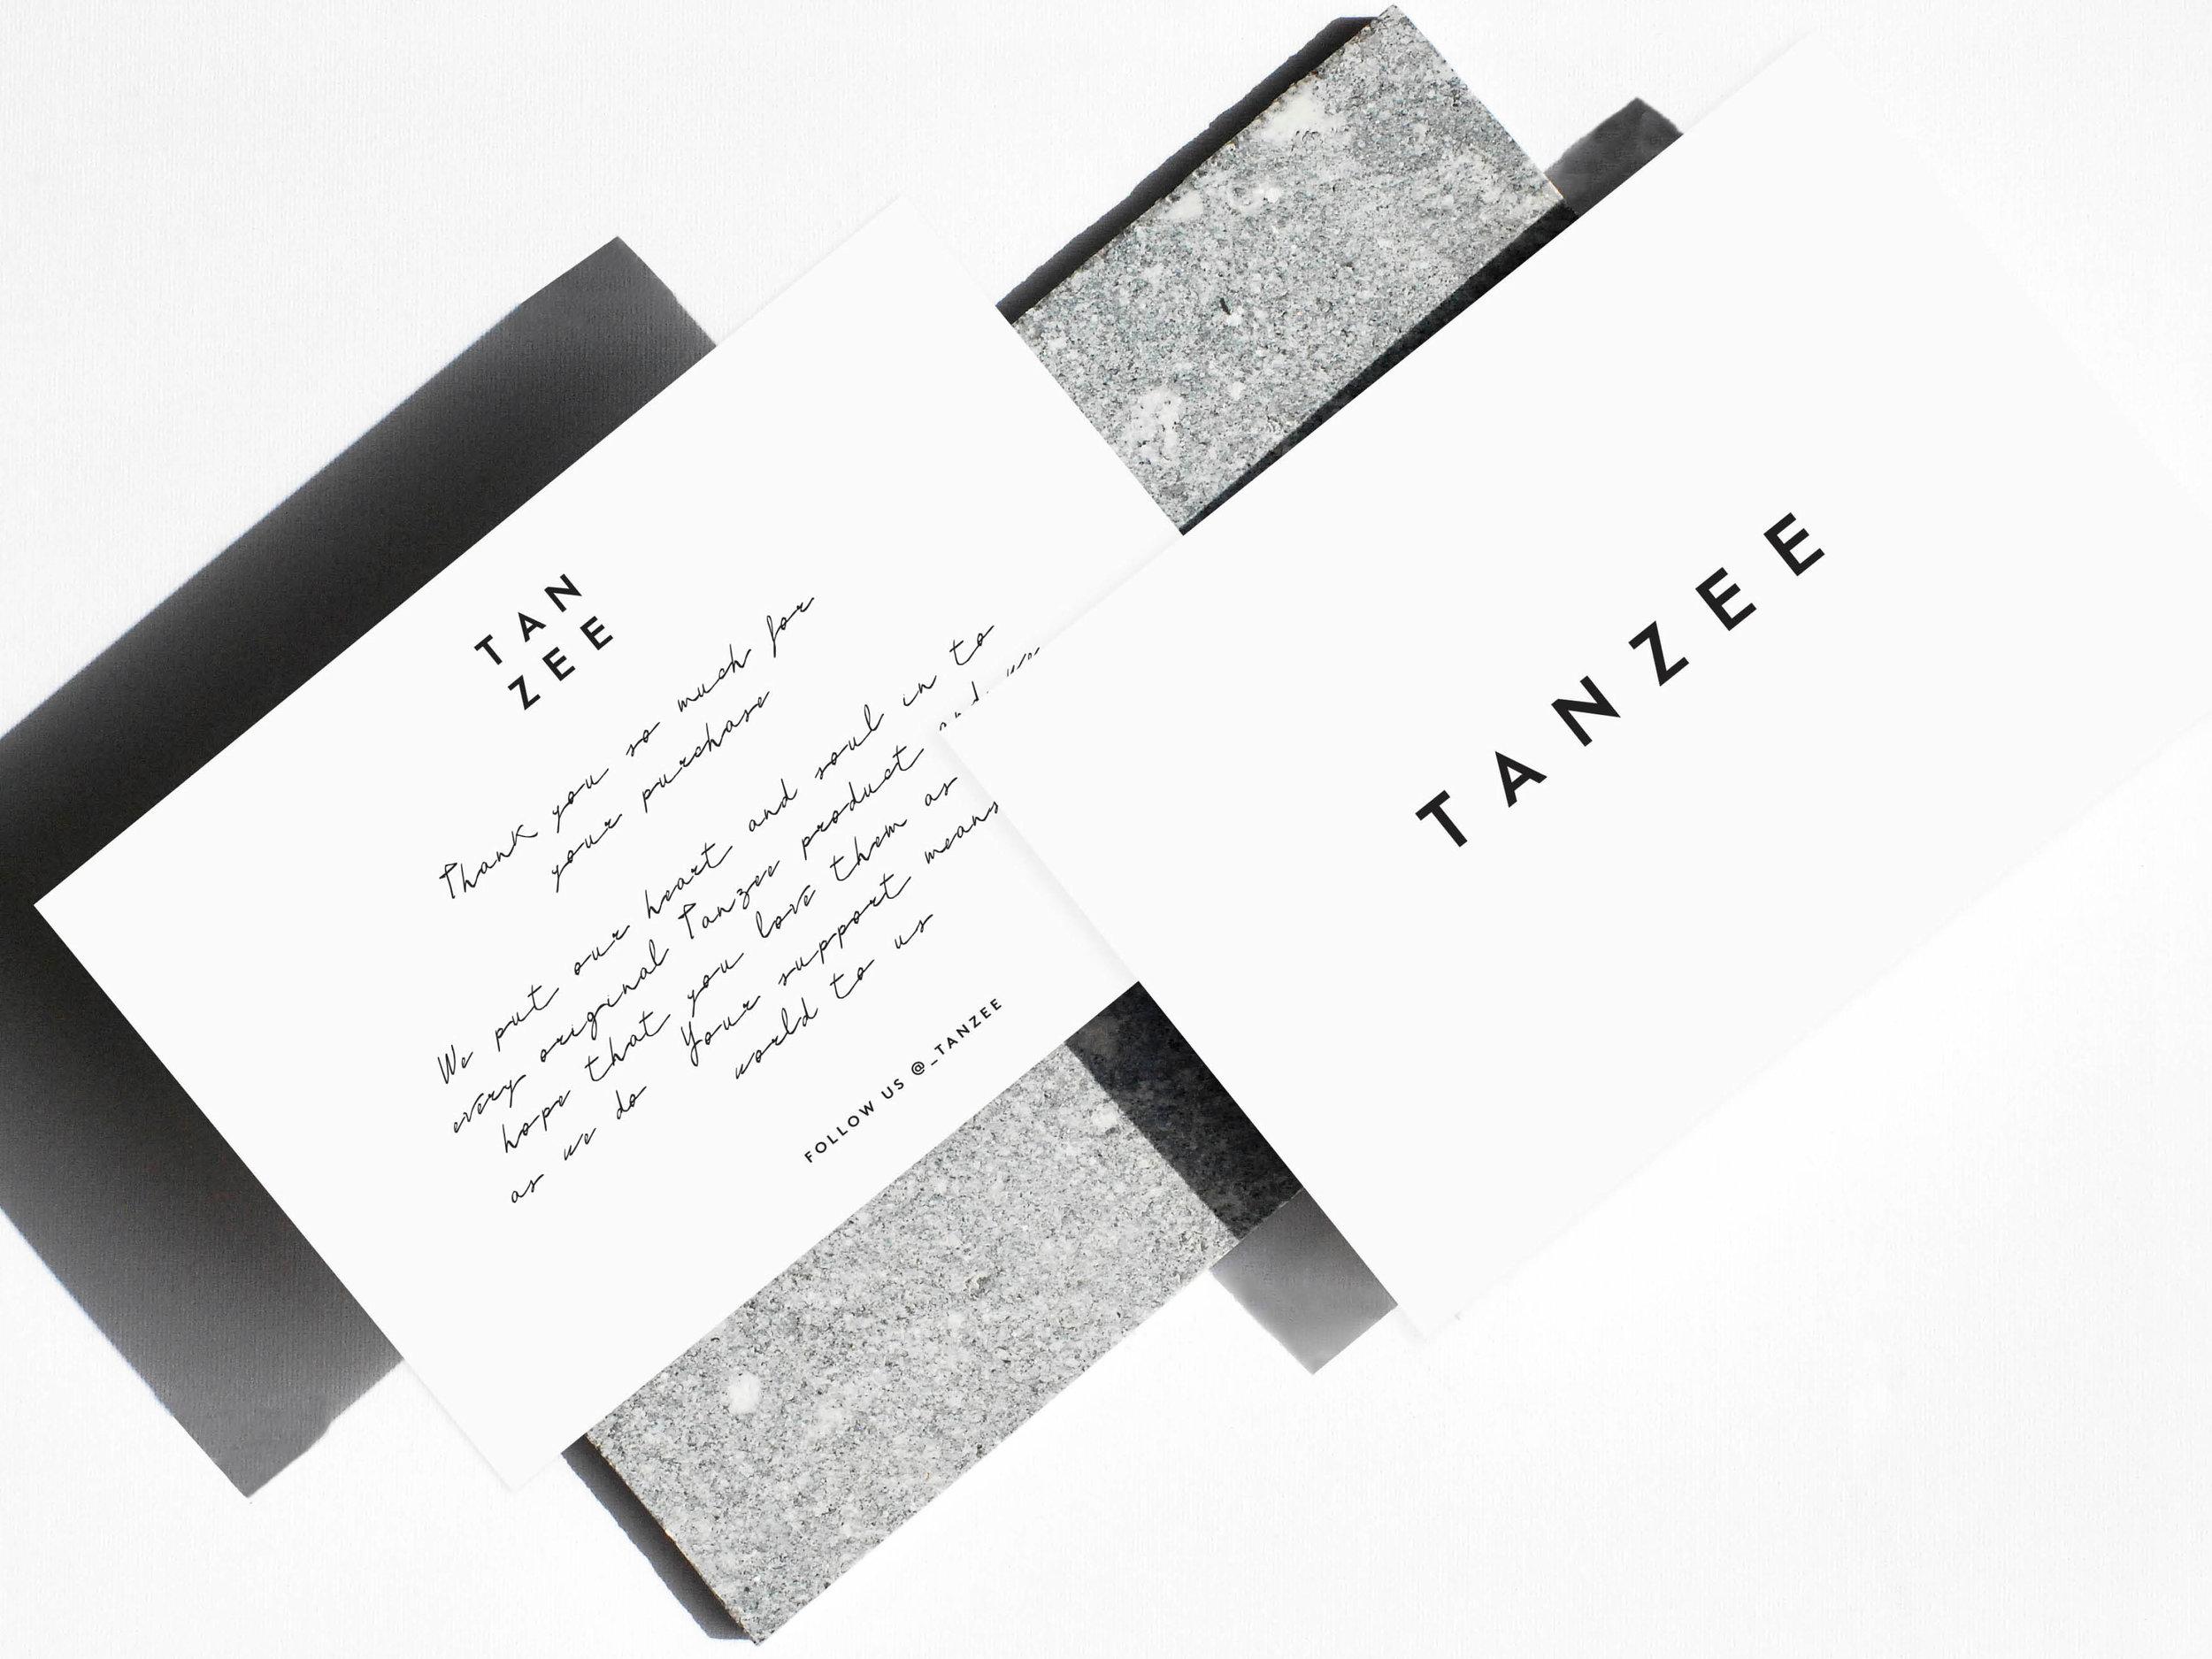 Tanzee_Body_Packaging_Branding_Design_1